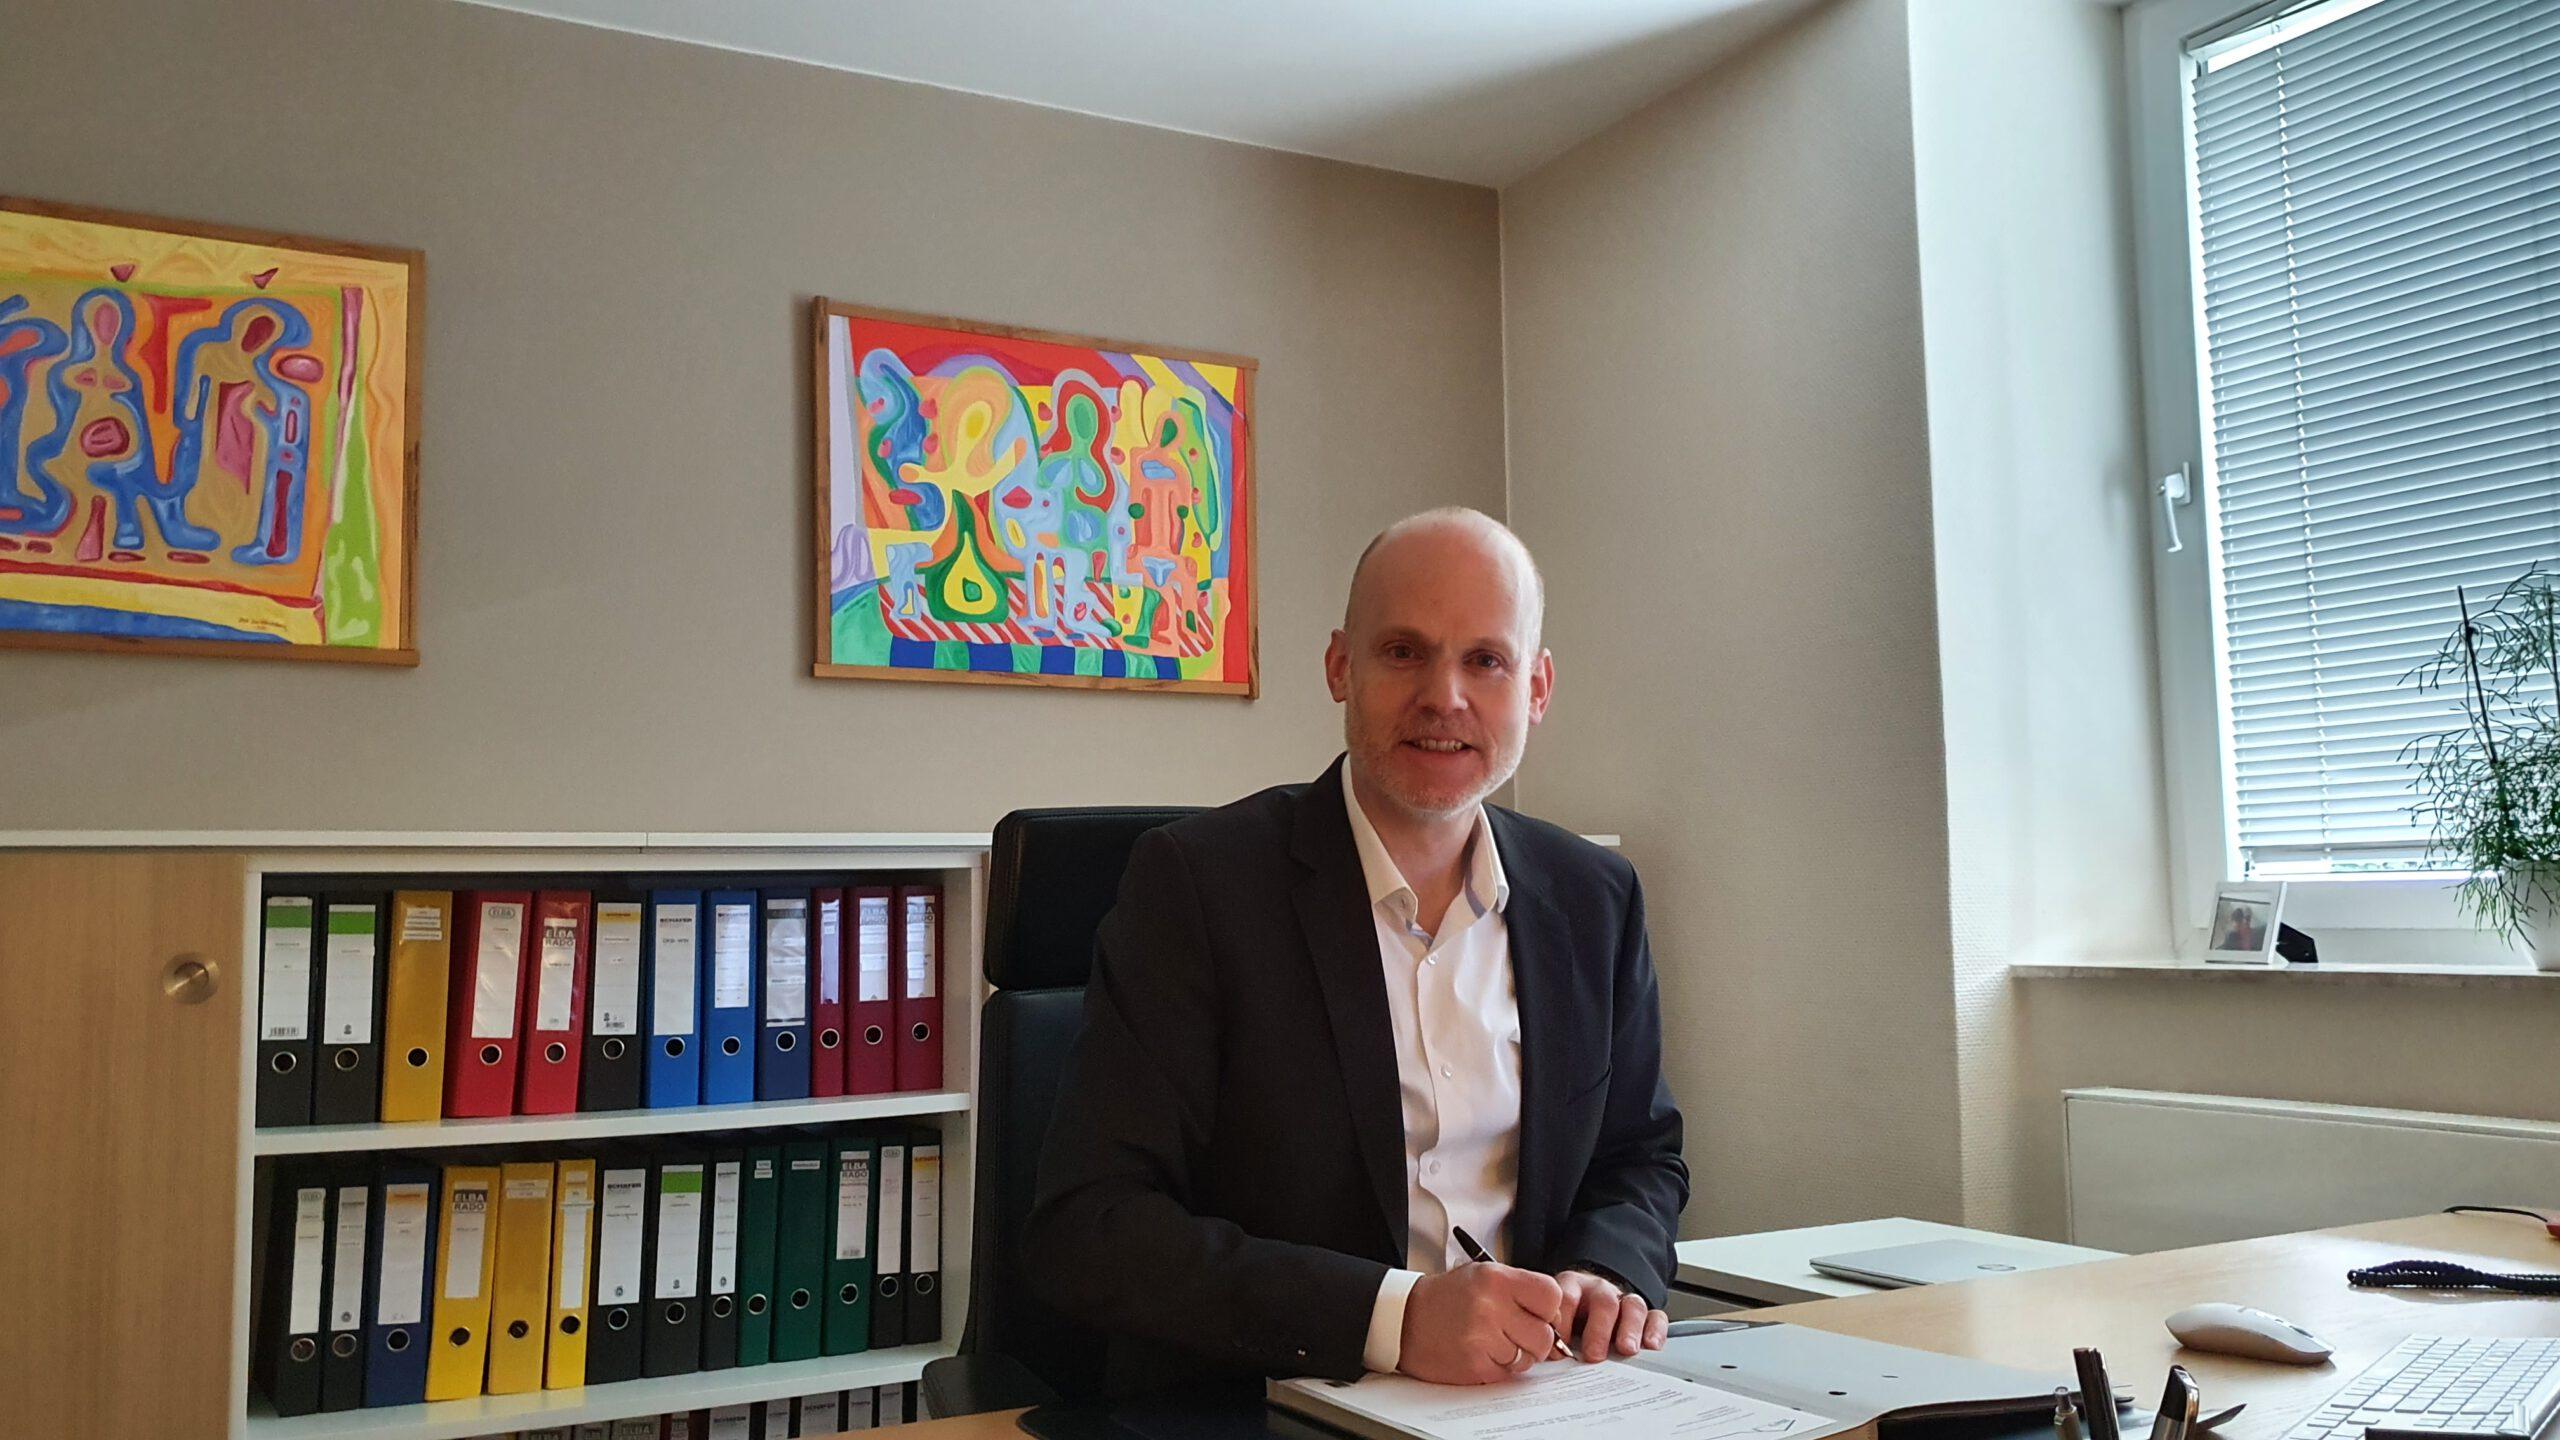 Jörg Kuhlmann